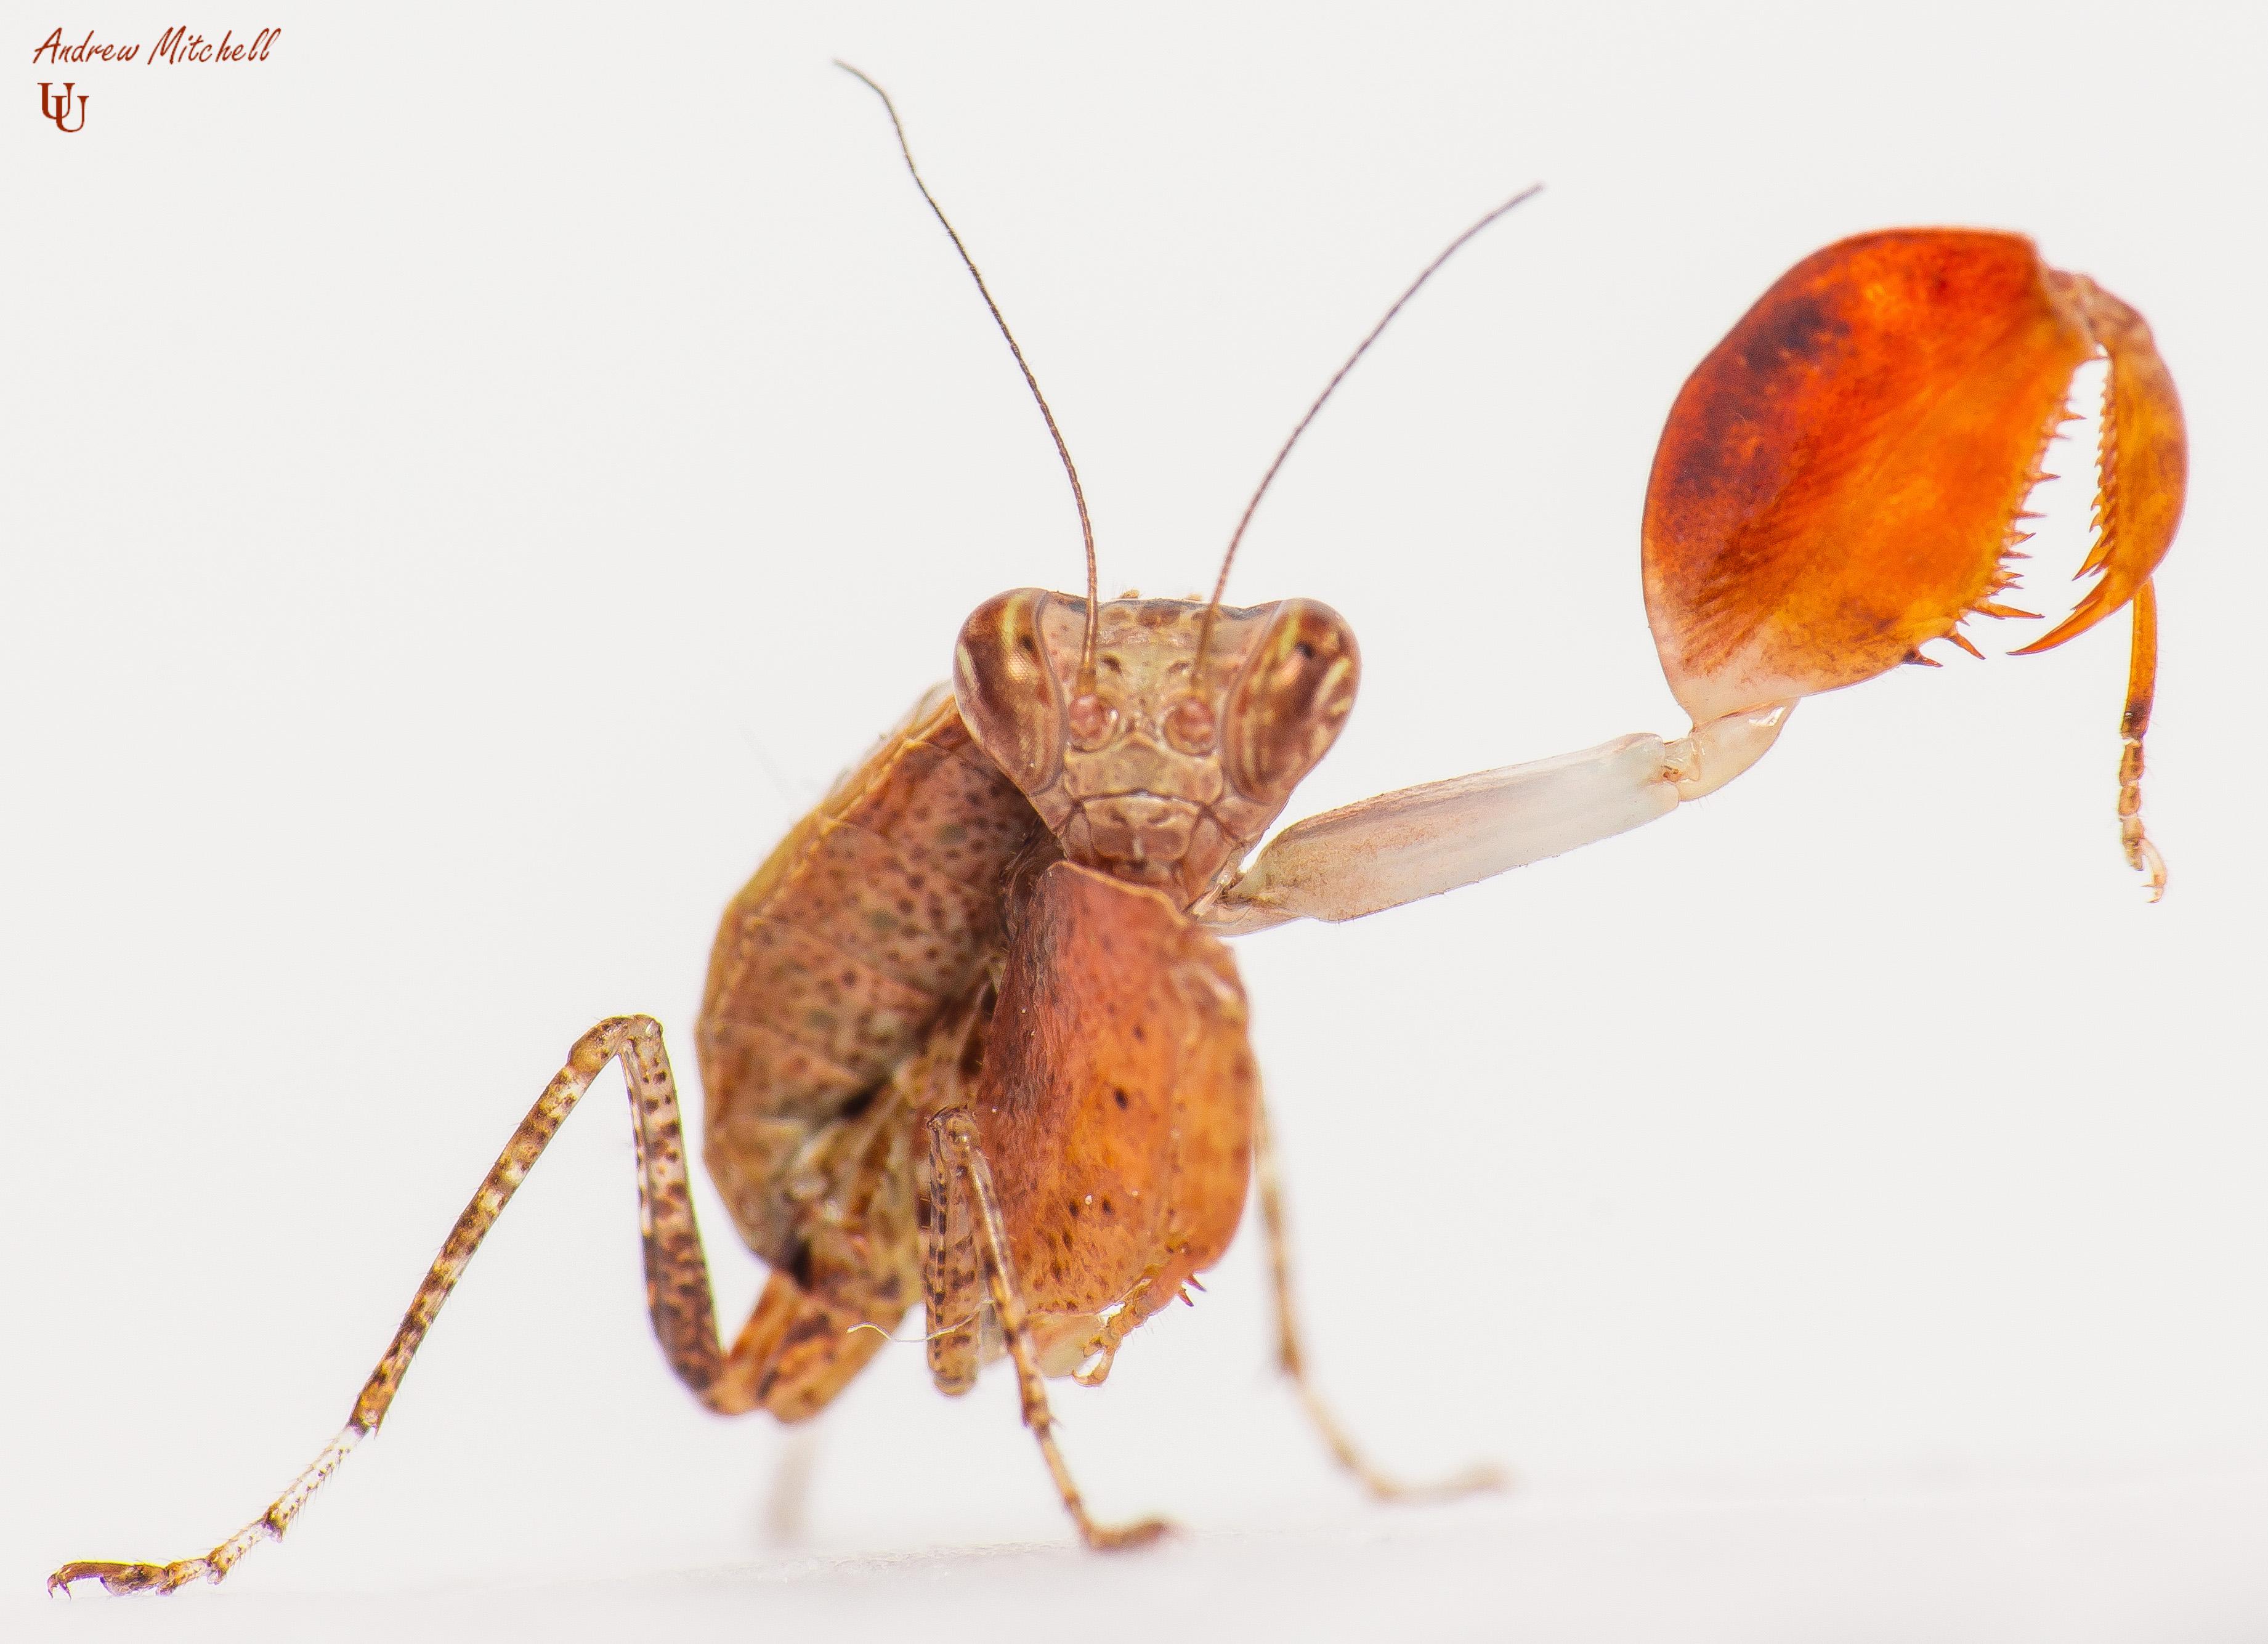 Hestiasula cf hoffmanni (Boxer Mantis)